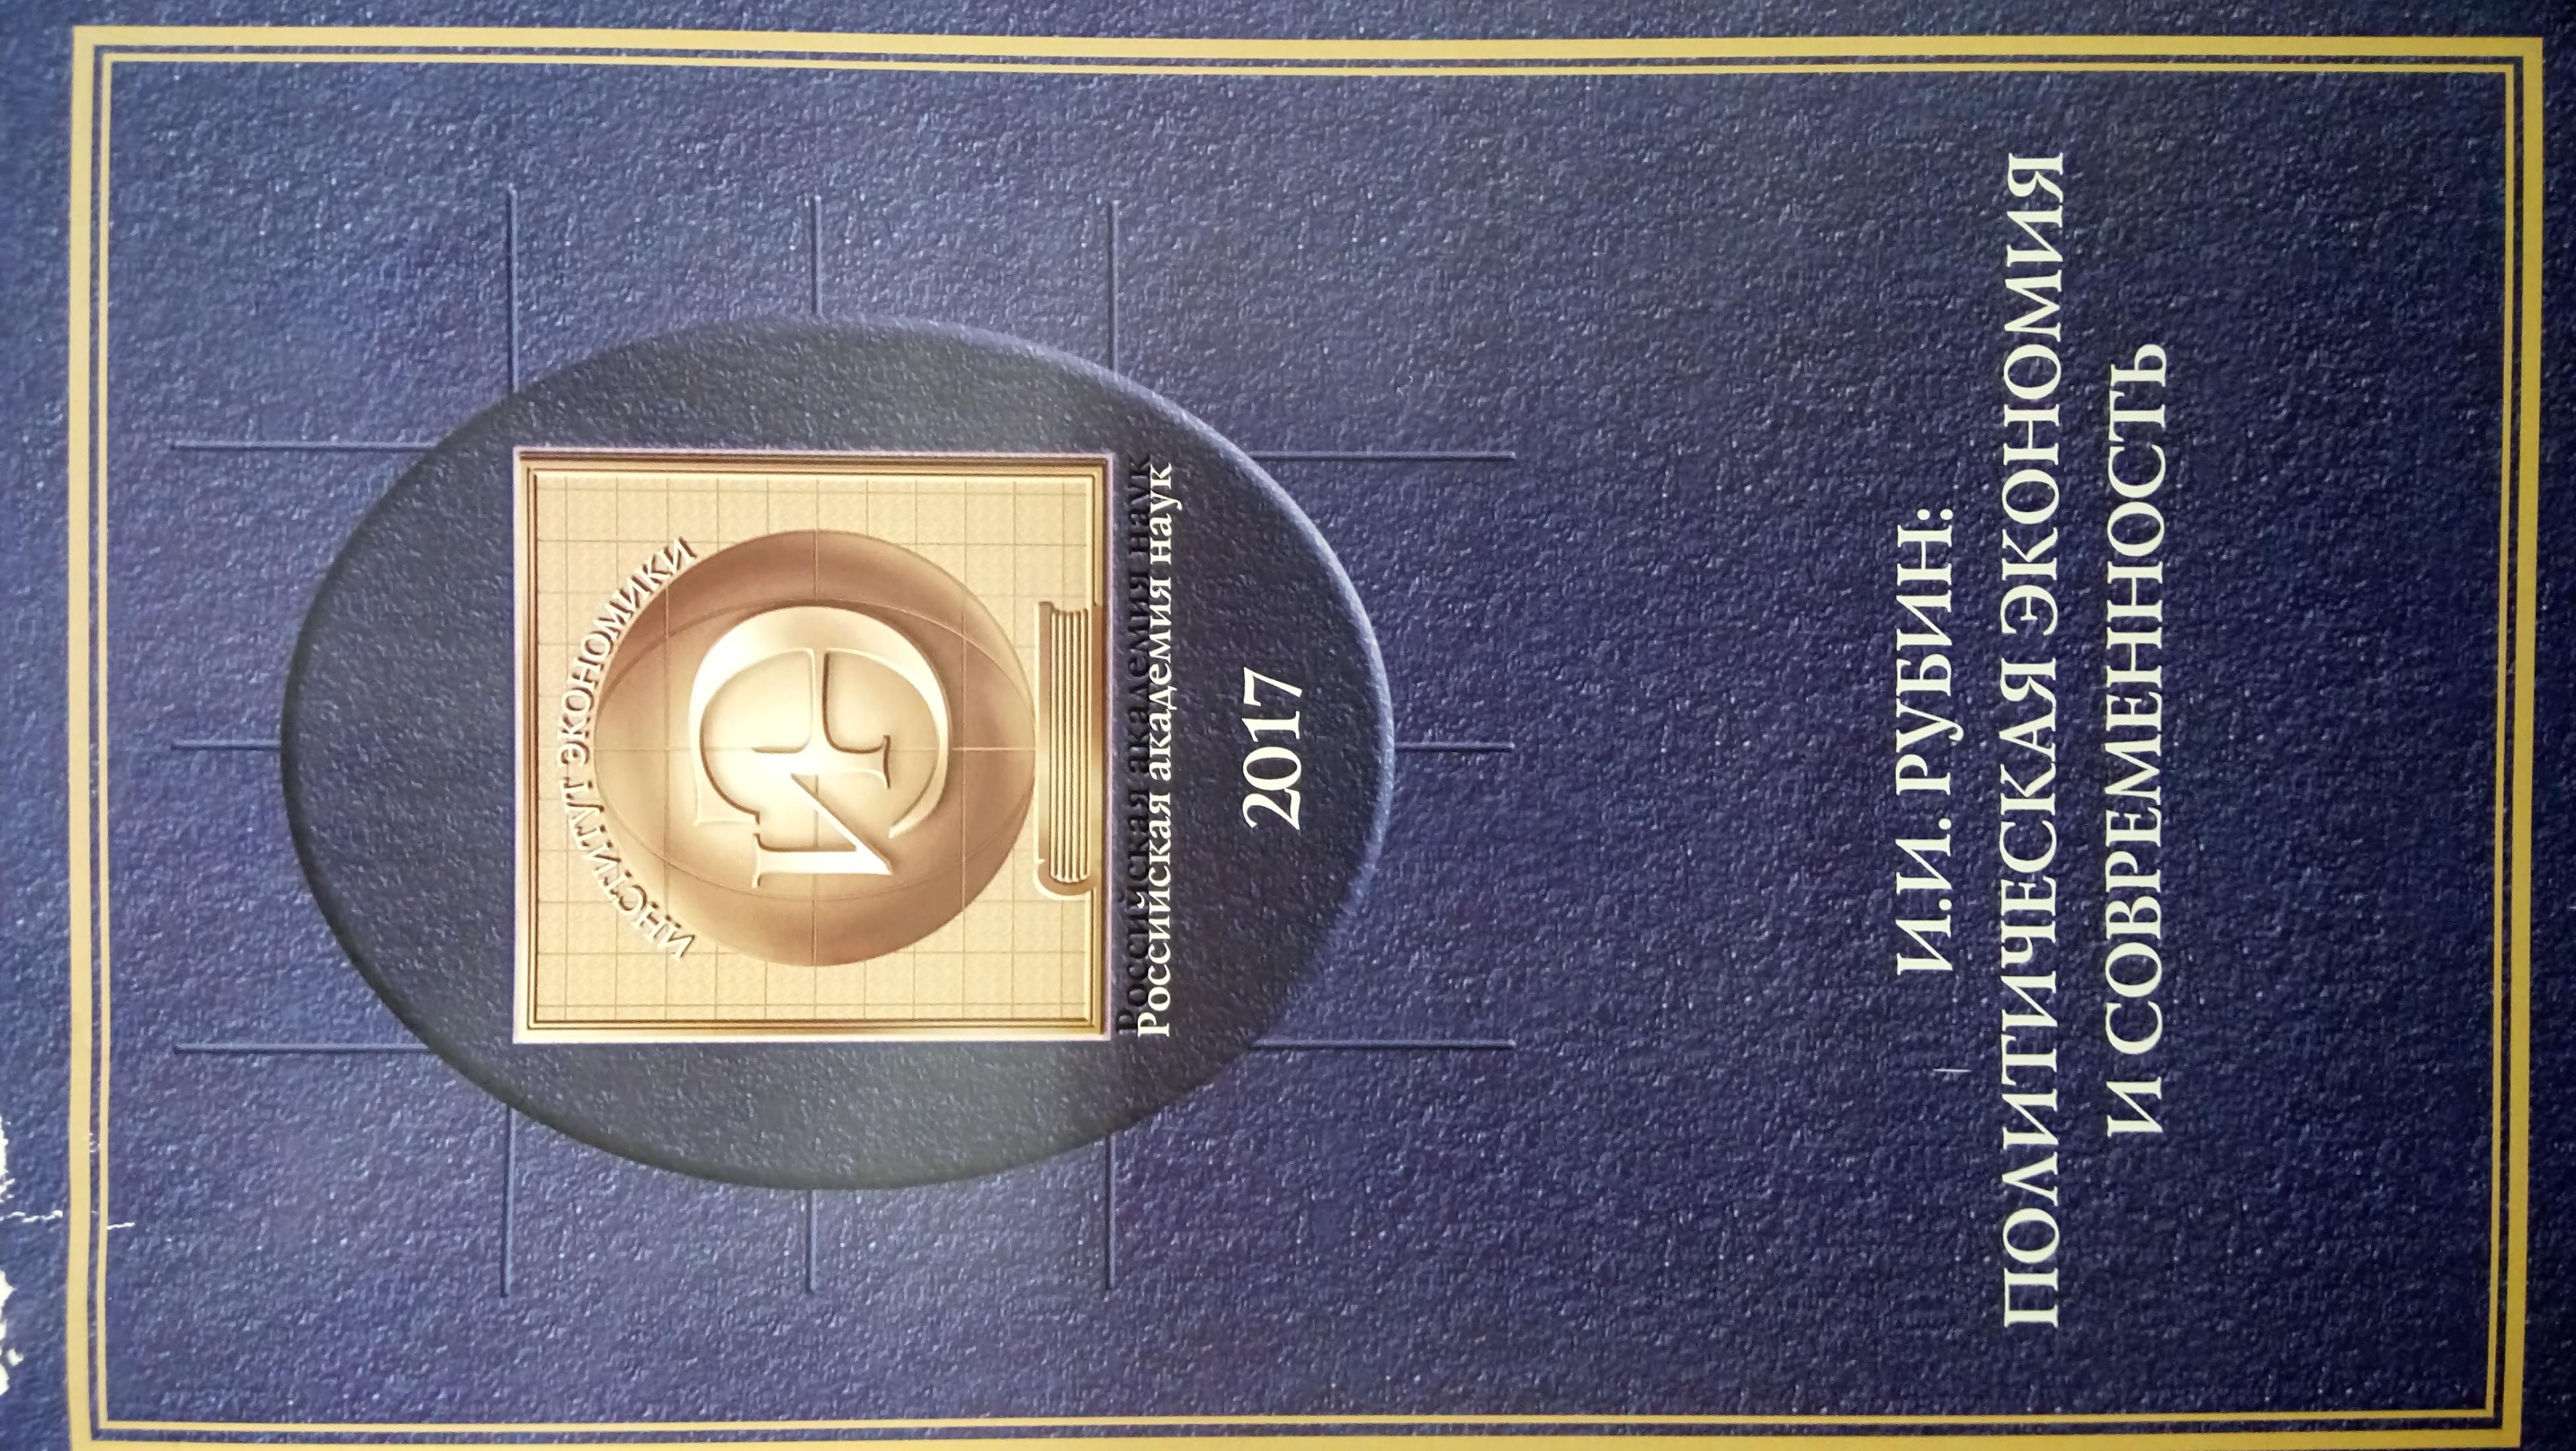 Онтология и гносеология капитализма: «Очерки по теории стоимости Маркса» И.И. Рубина